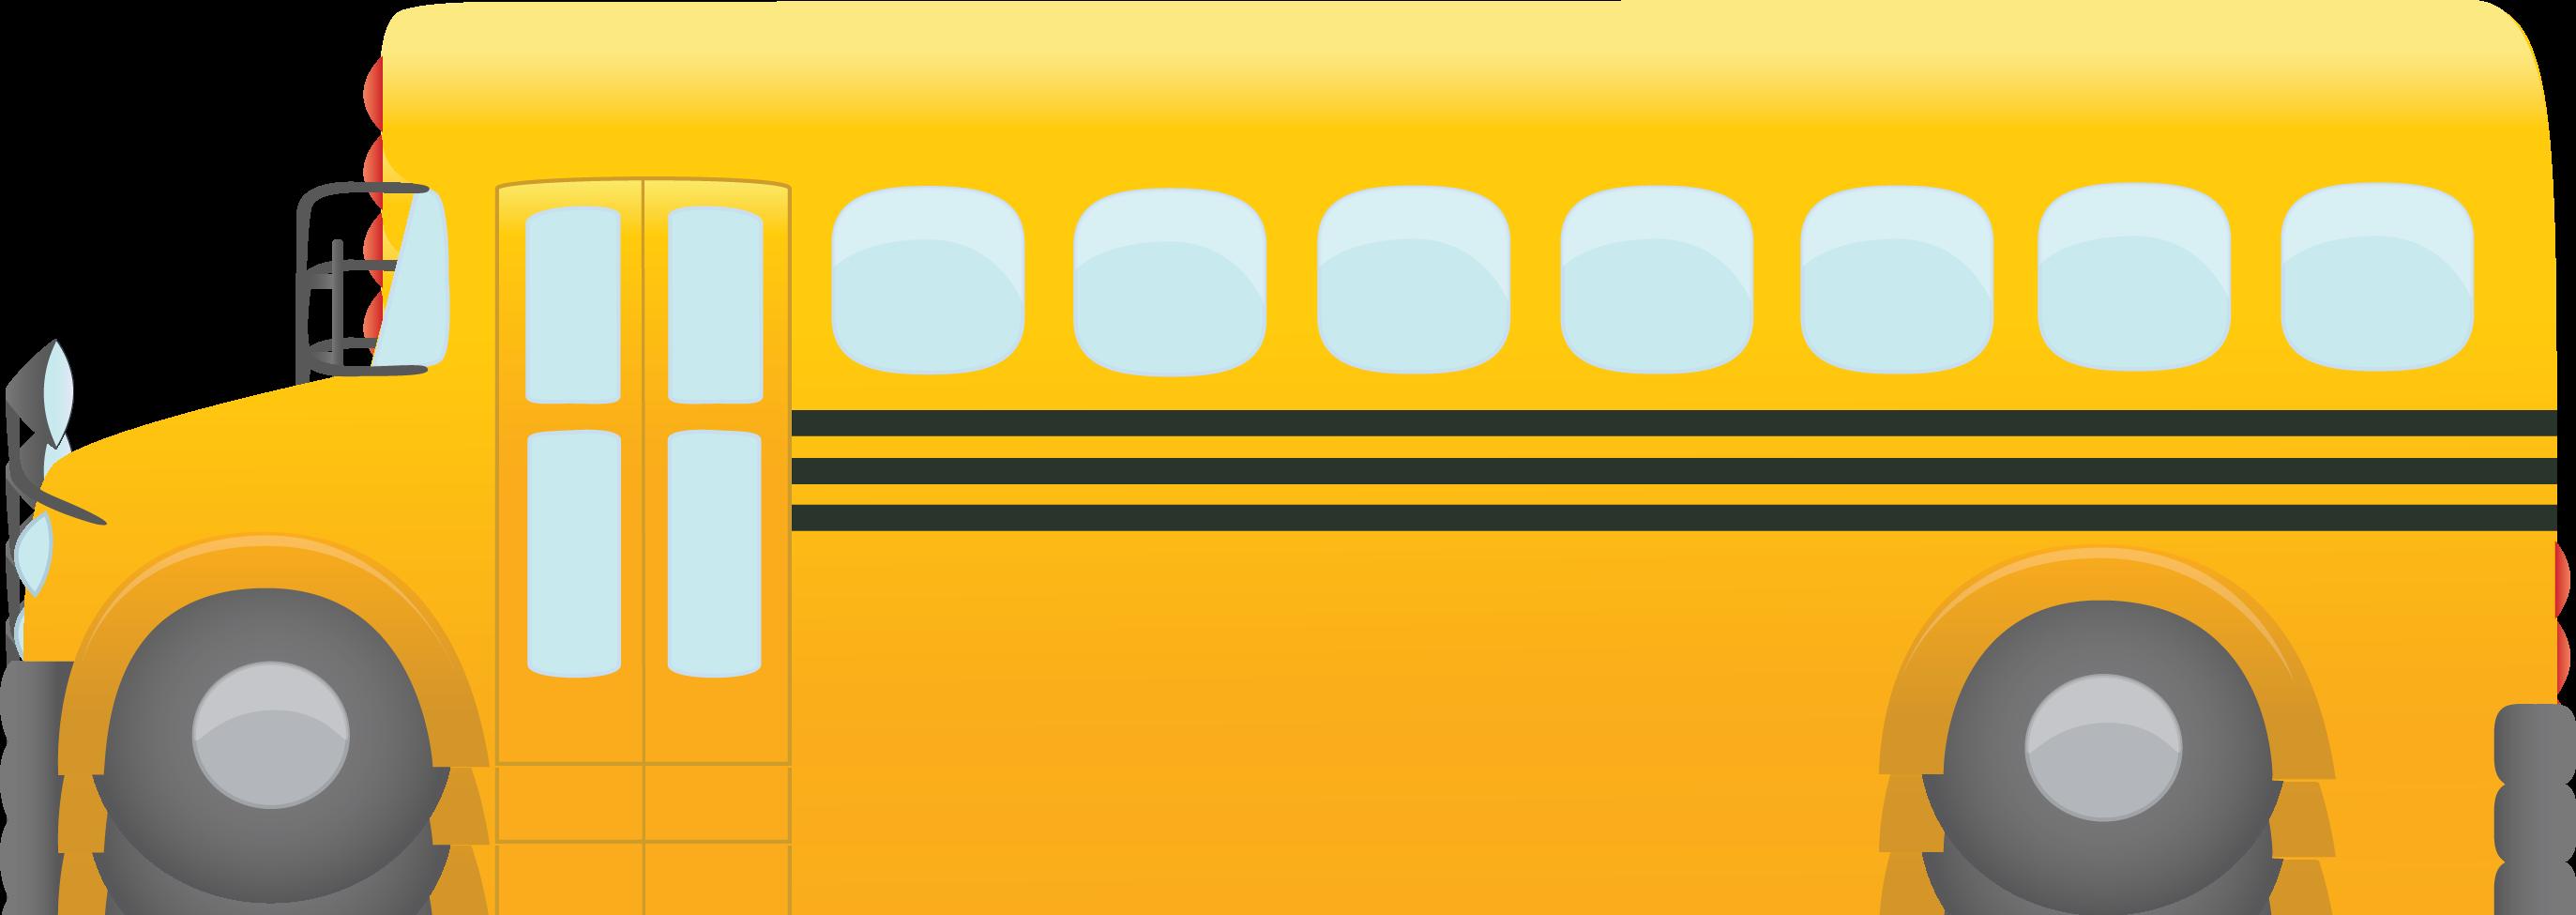 2746x975 Bus Png Transparent Images Free Download Clip Art Free Clip